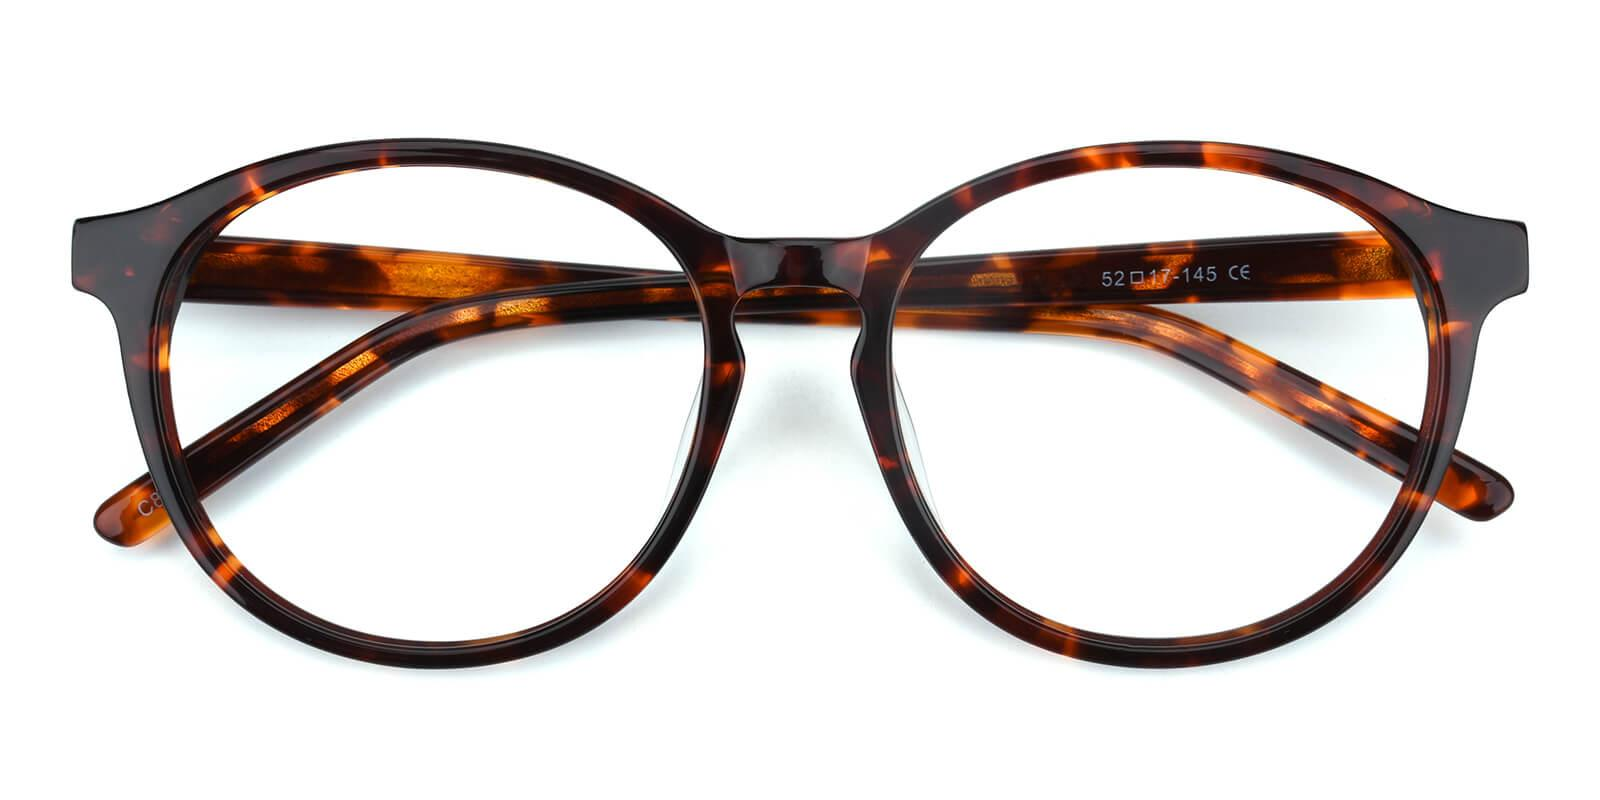 Havana-Tortoise-Round-Acetate-Eyeglasses-detail